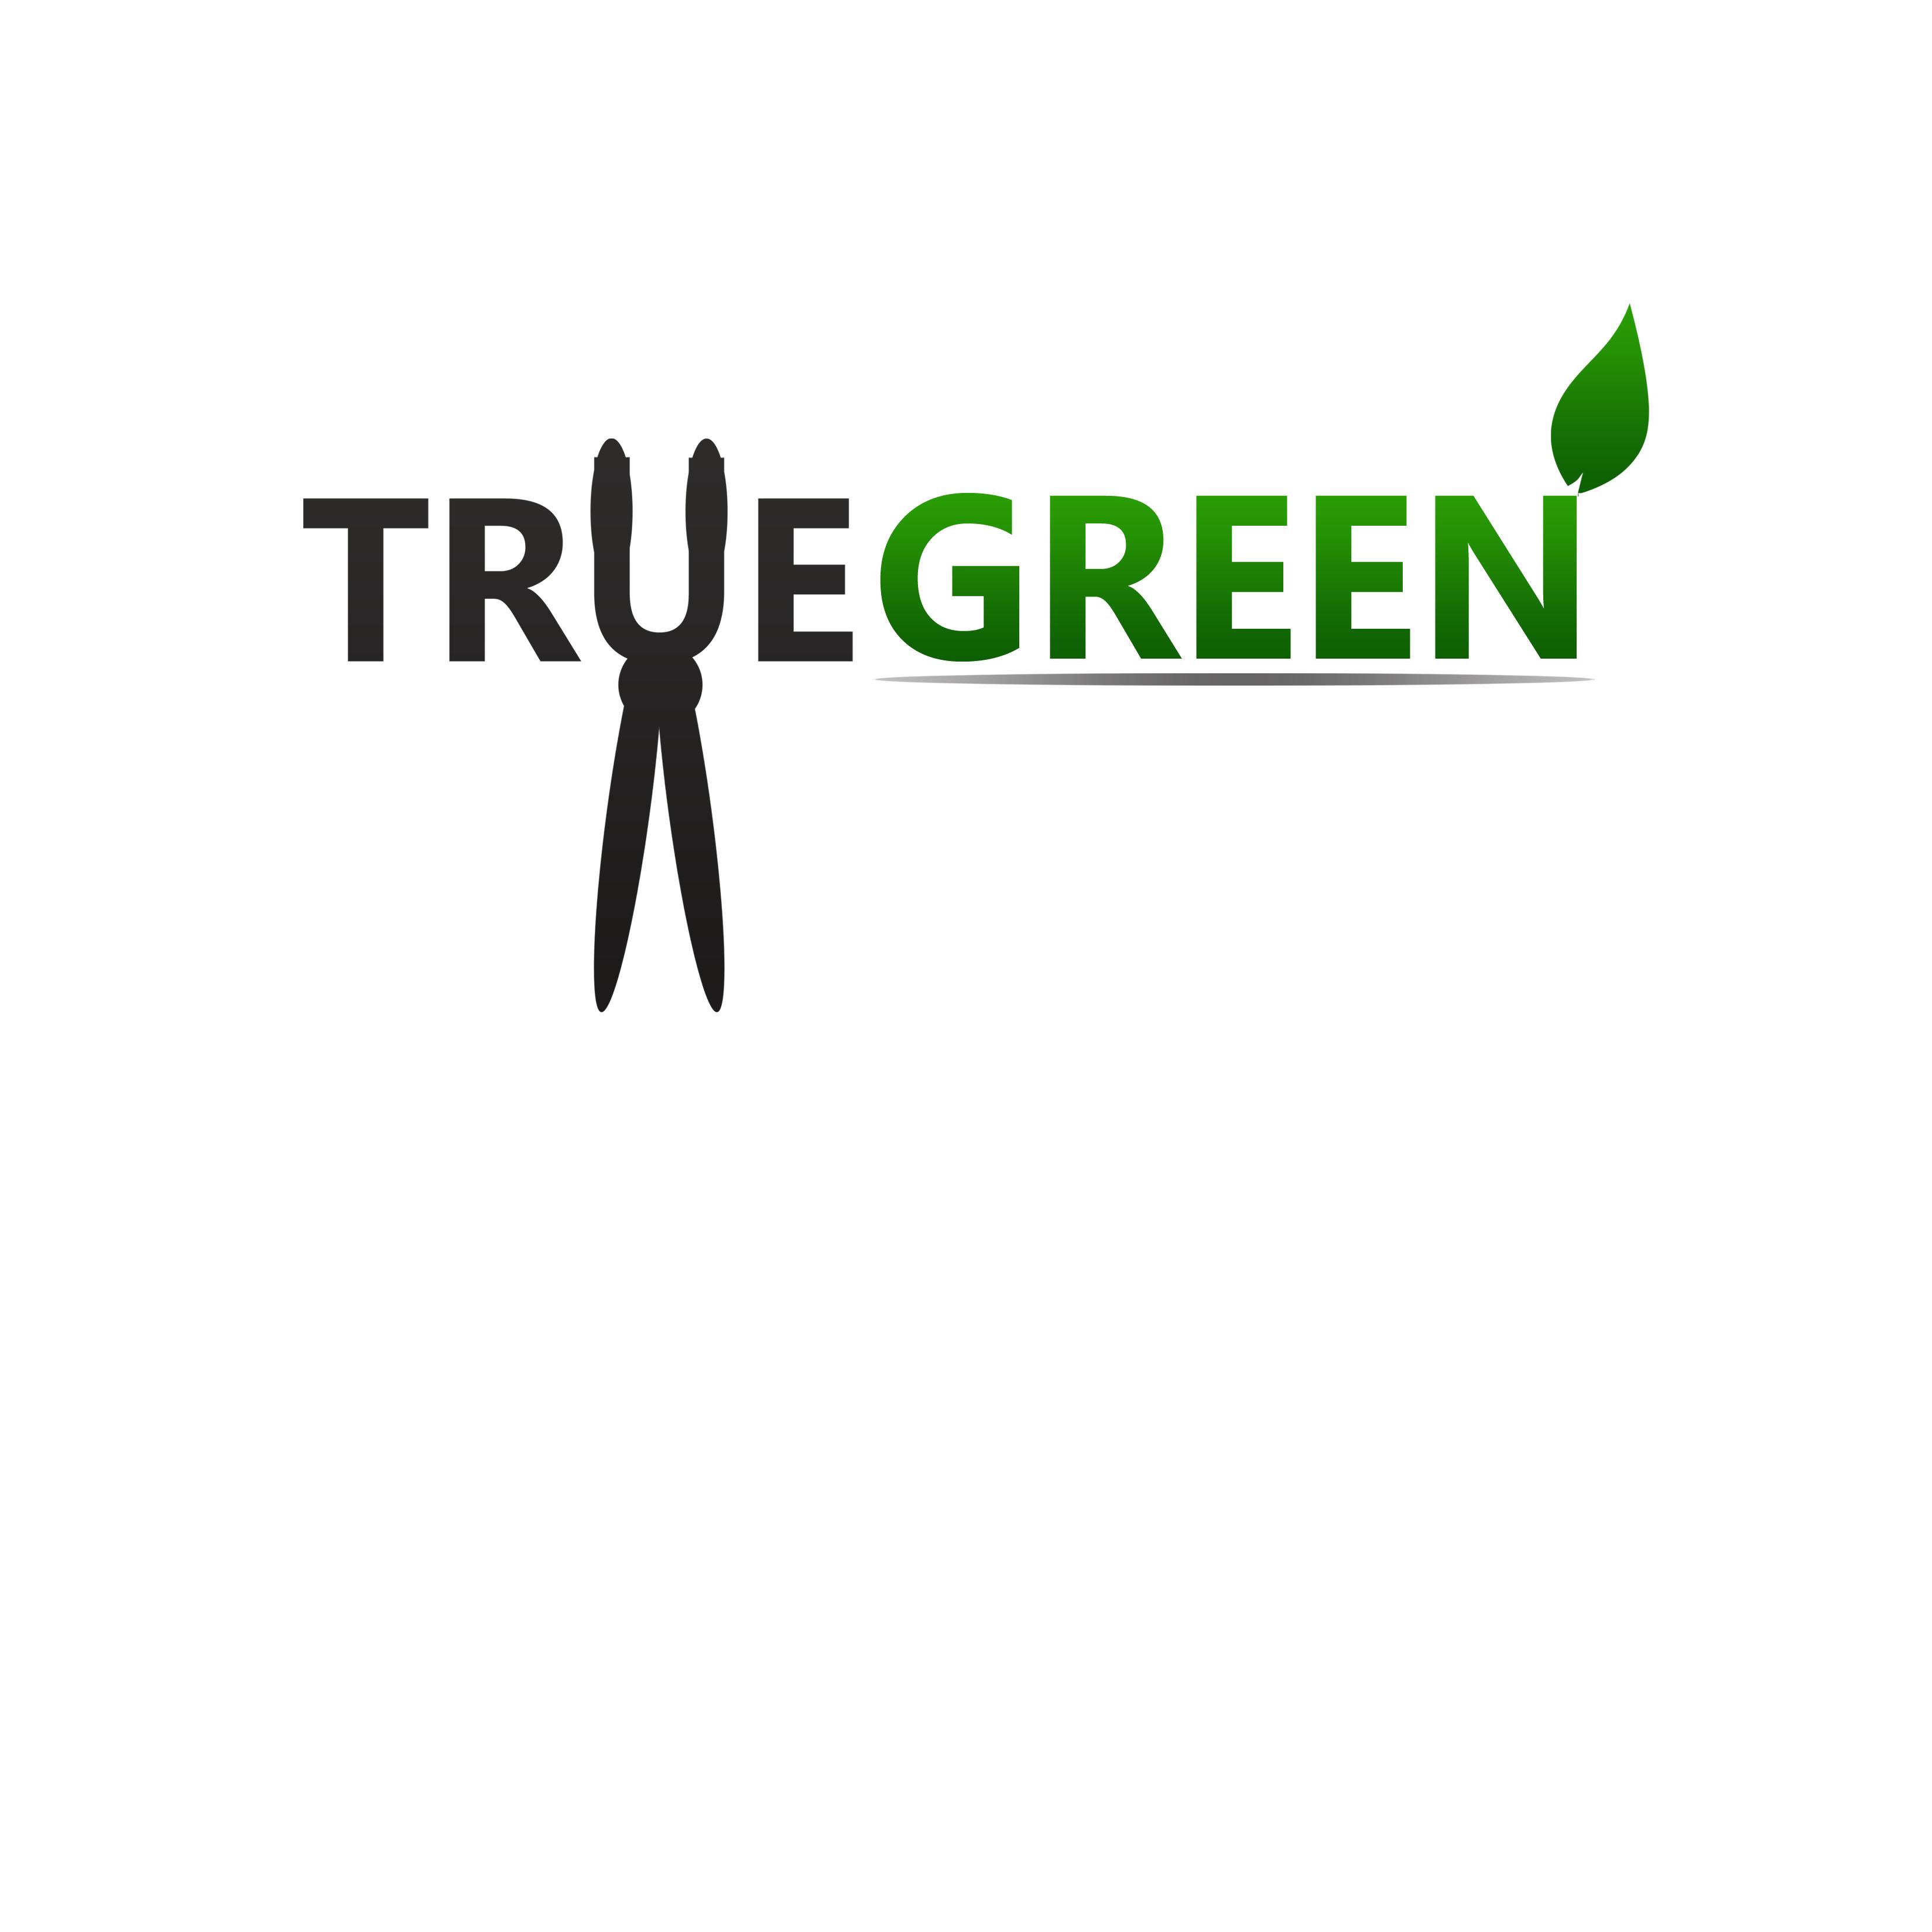 Logo Design by Allan Esclamado - Entry No. 76 in the Logo Design Contest Fun Logo Design for TRUE GREEN.